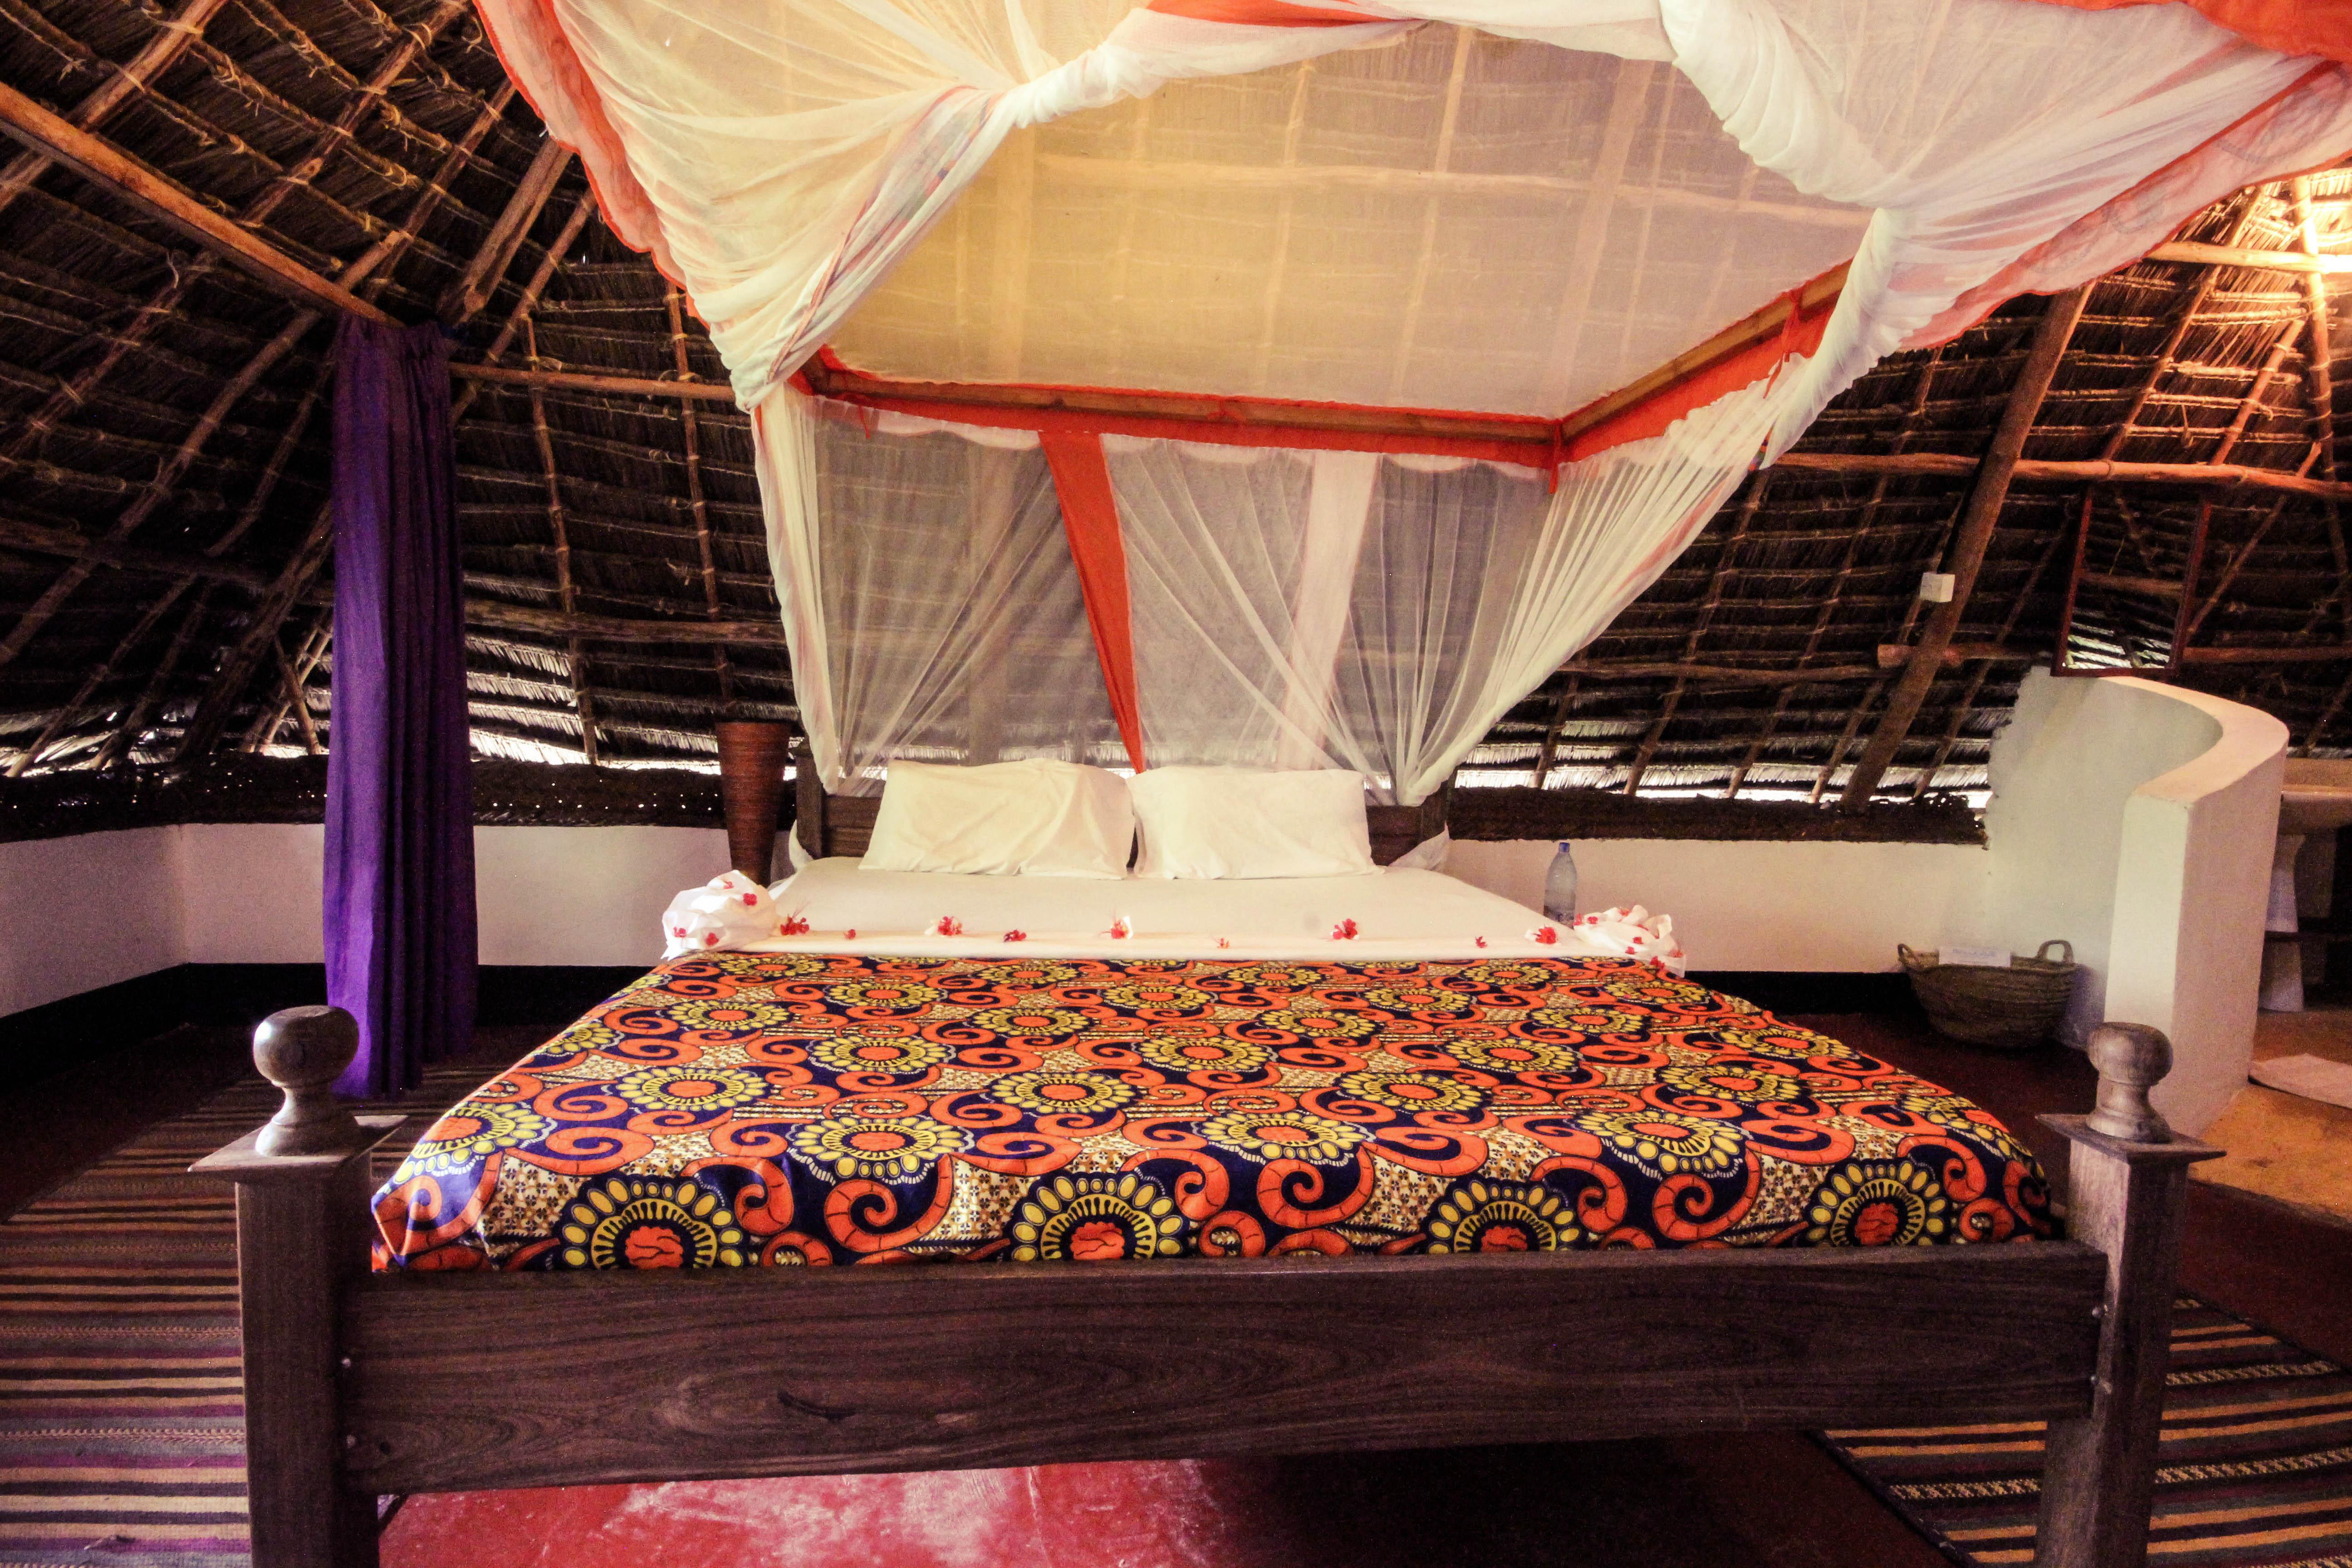 Bellevue Garden Caottage bed